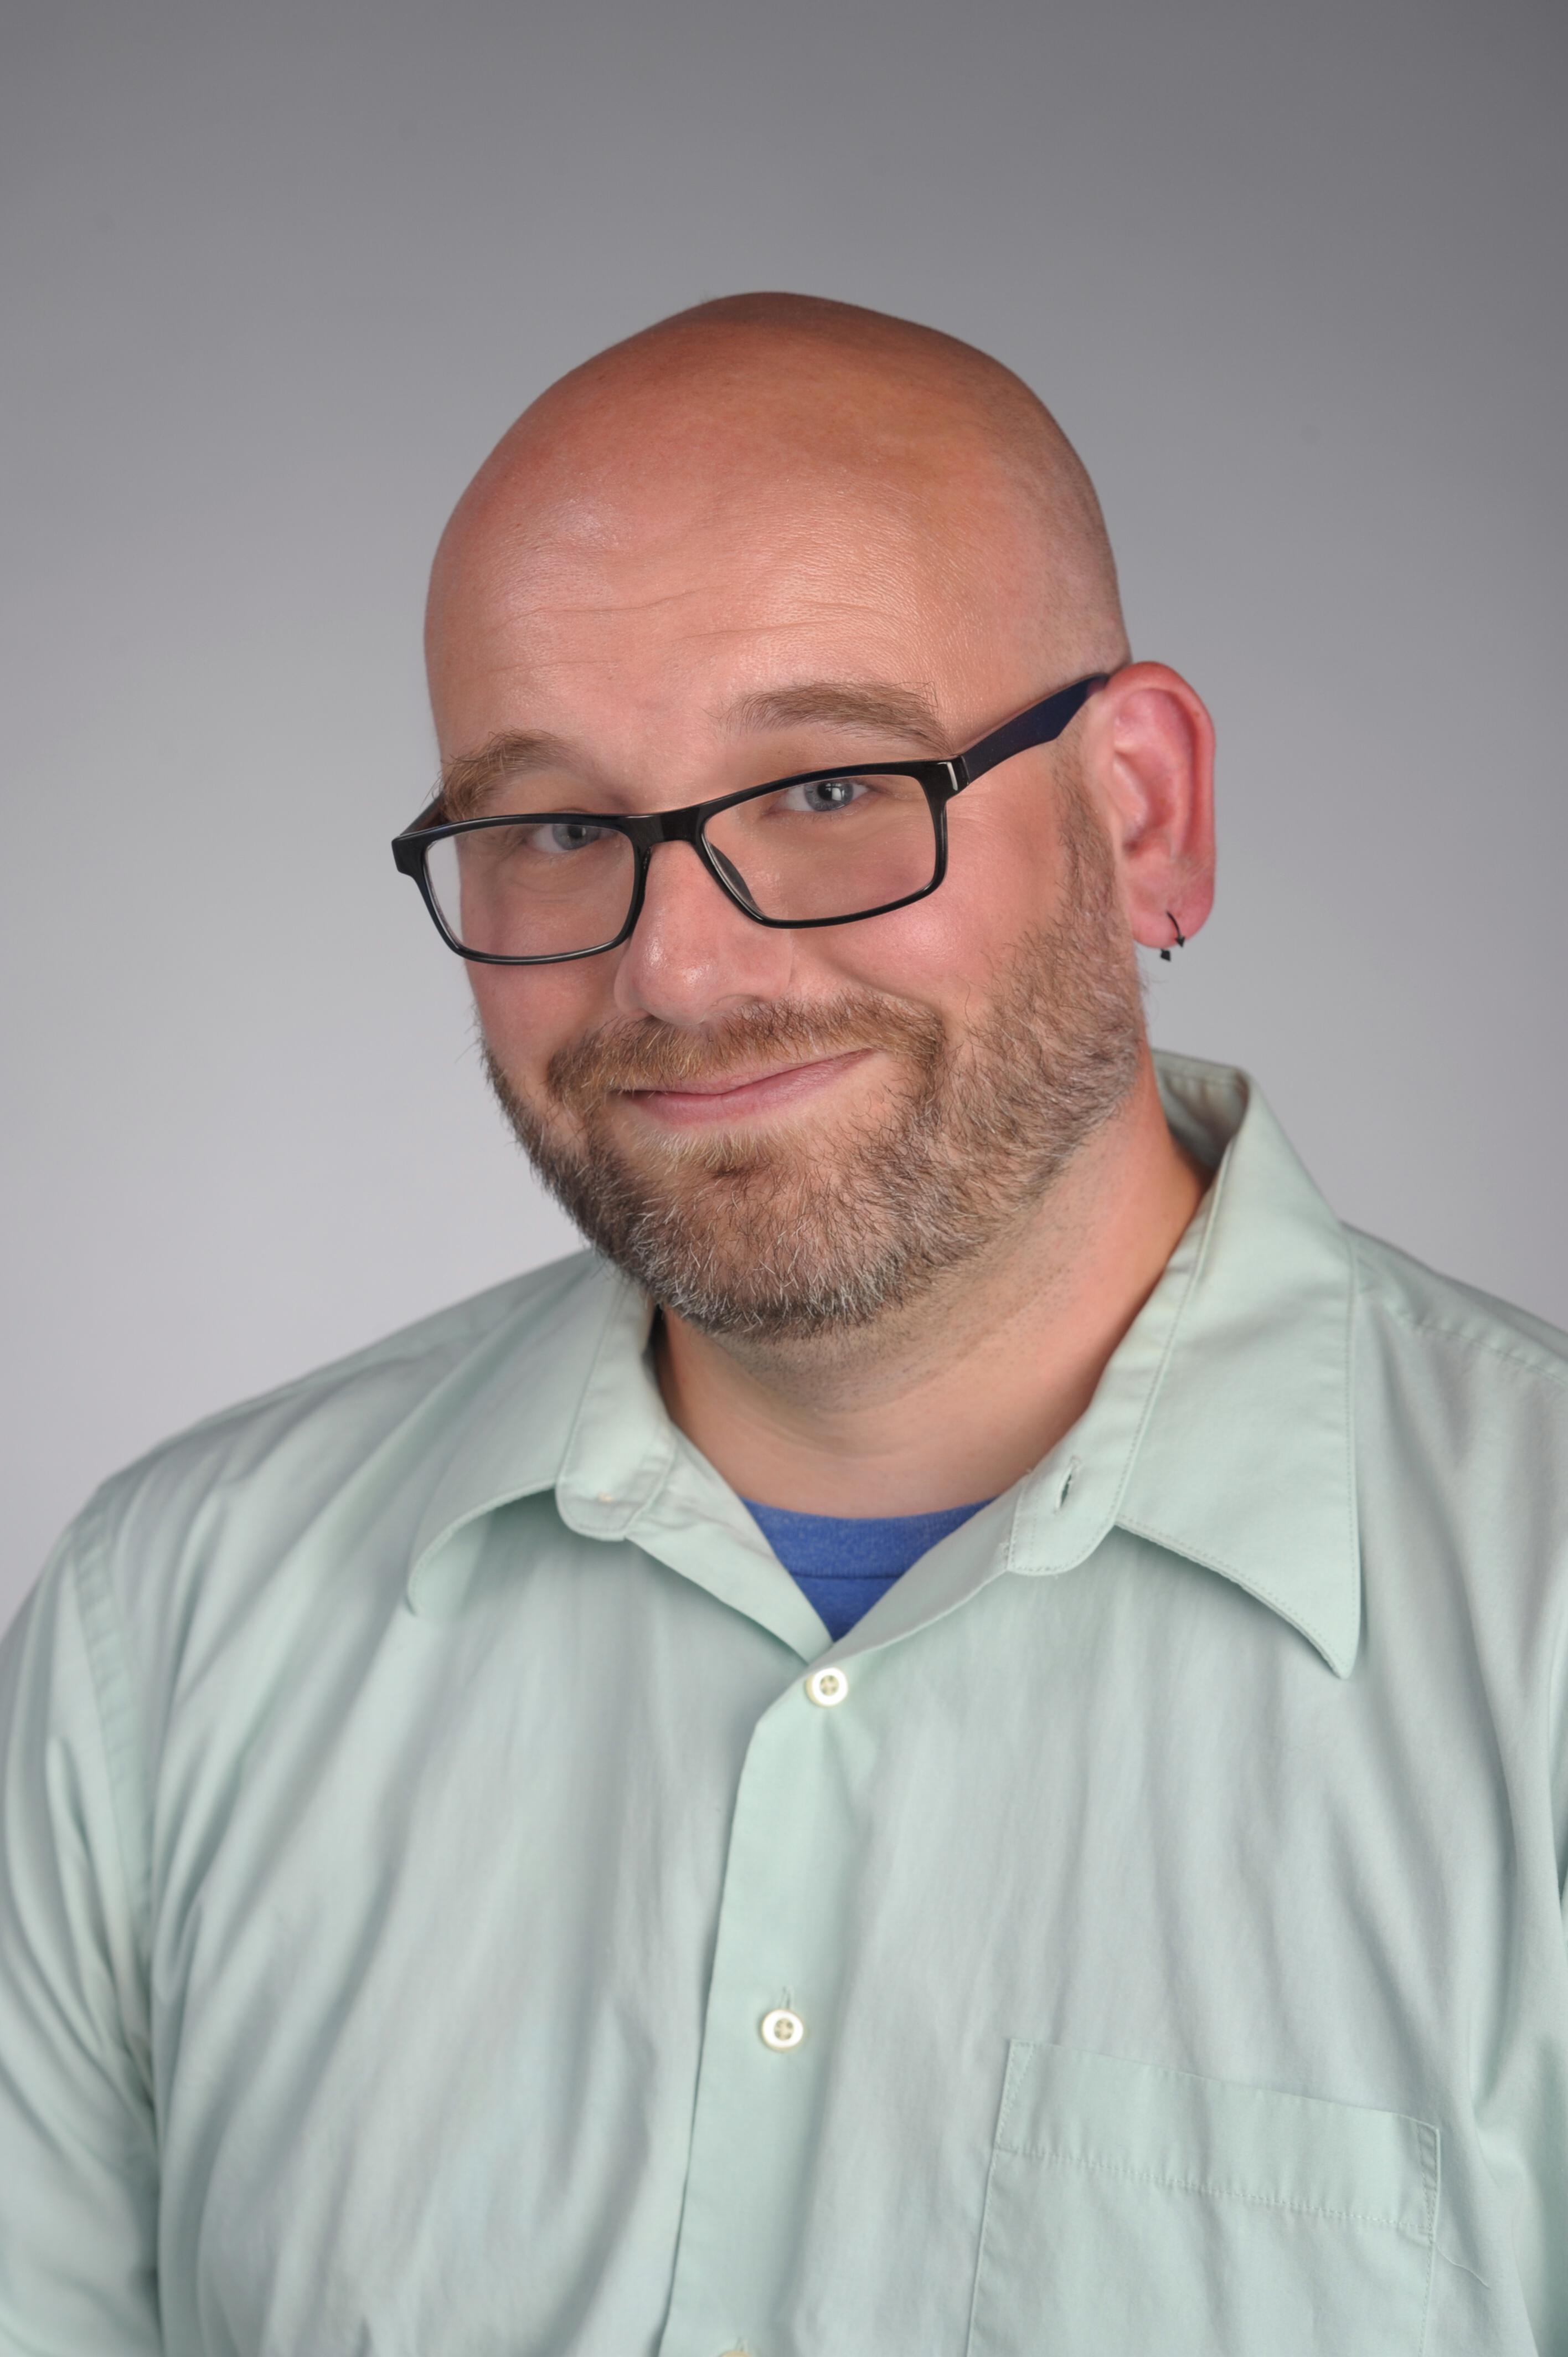 Senior Lab Animal Technician David Carnes